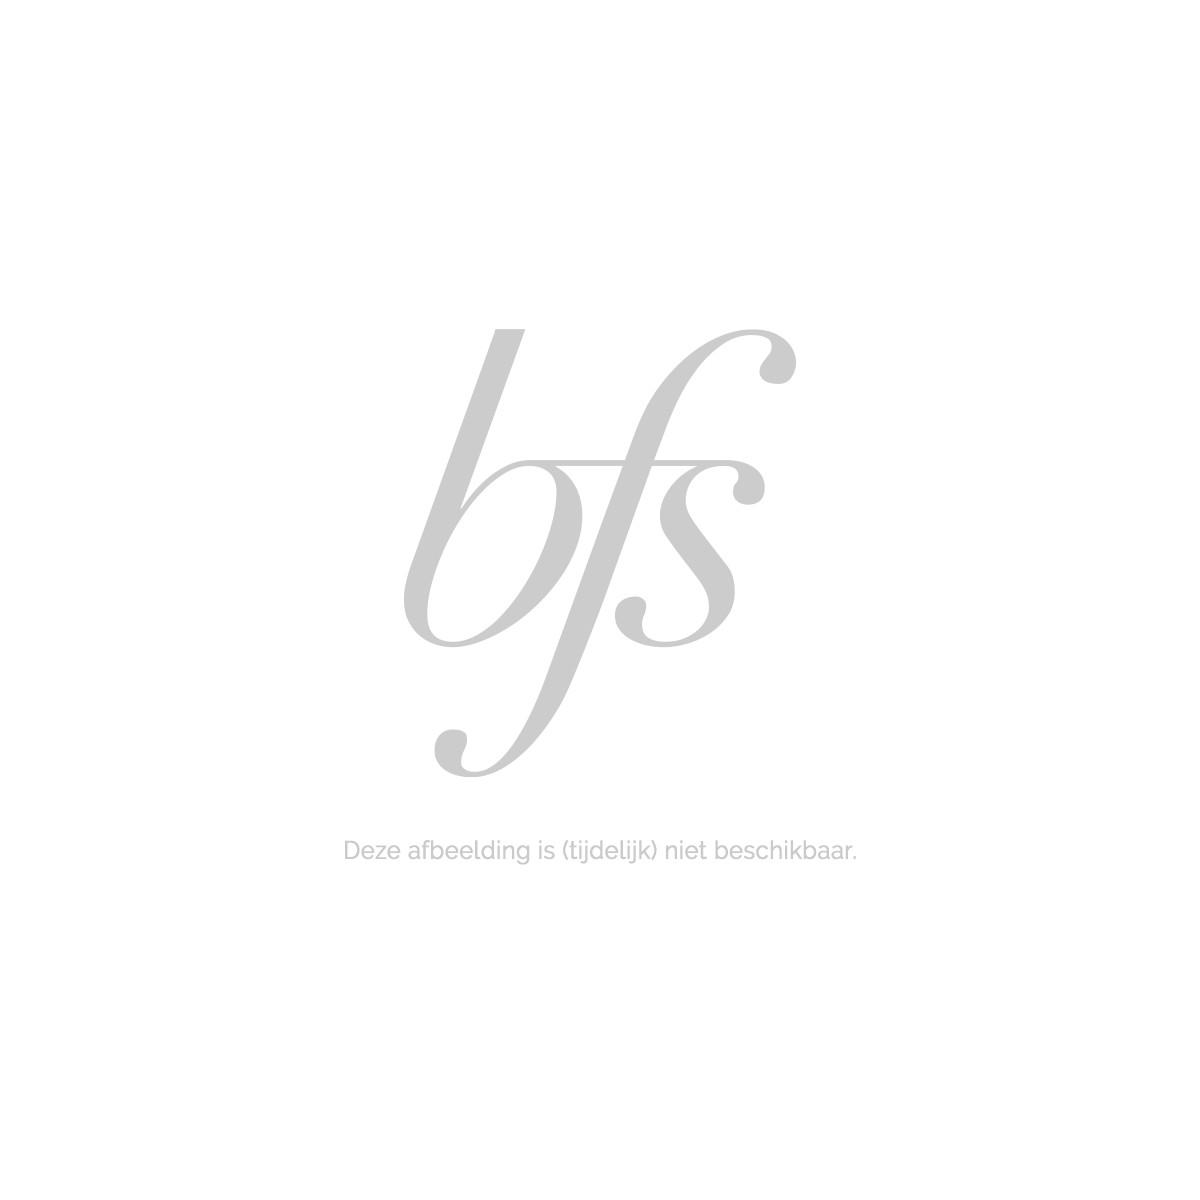 Michael Kors Glam Jasmine Eau de Parfum 100 ml